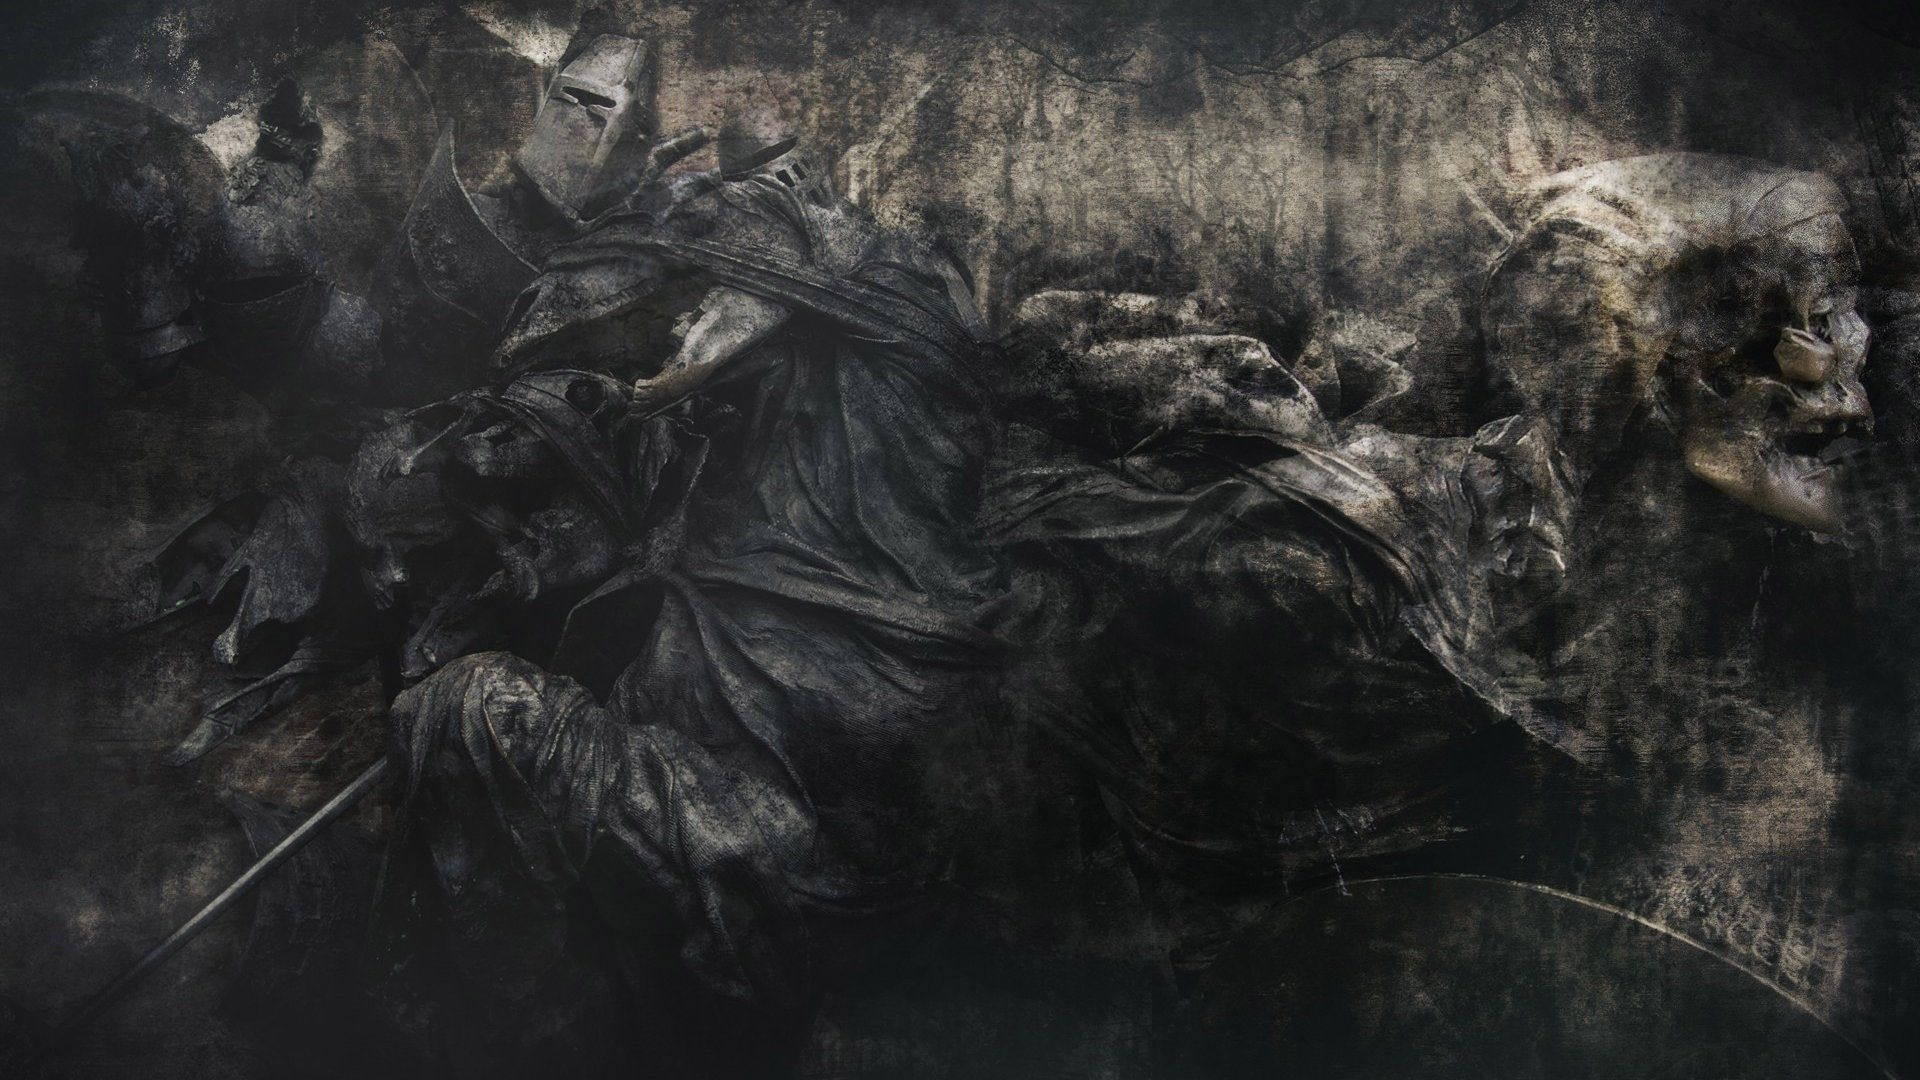 2016-05-21 - dark evil picture free, #27729